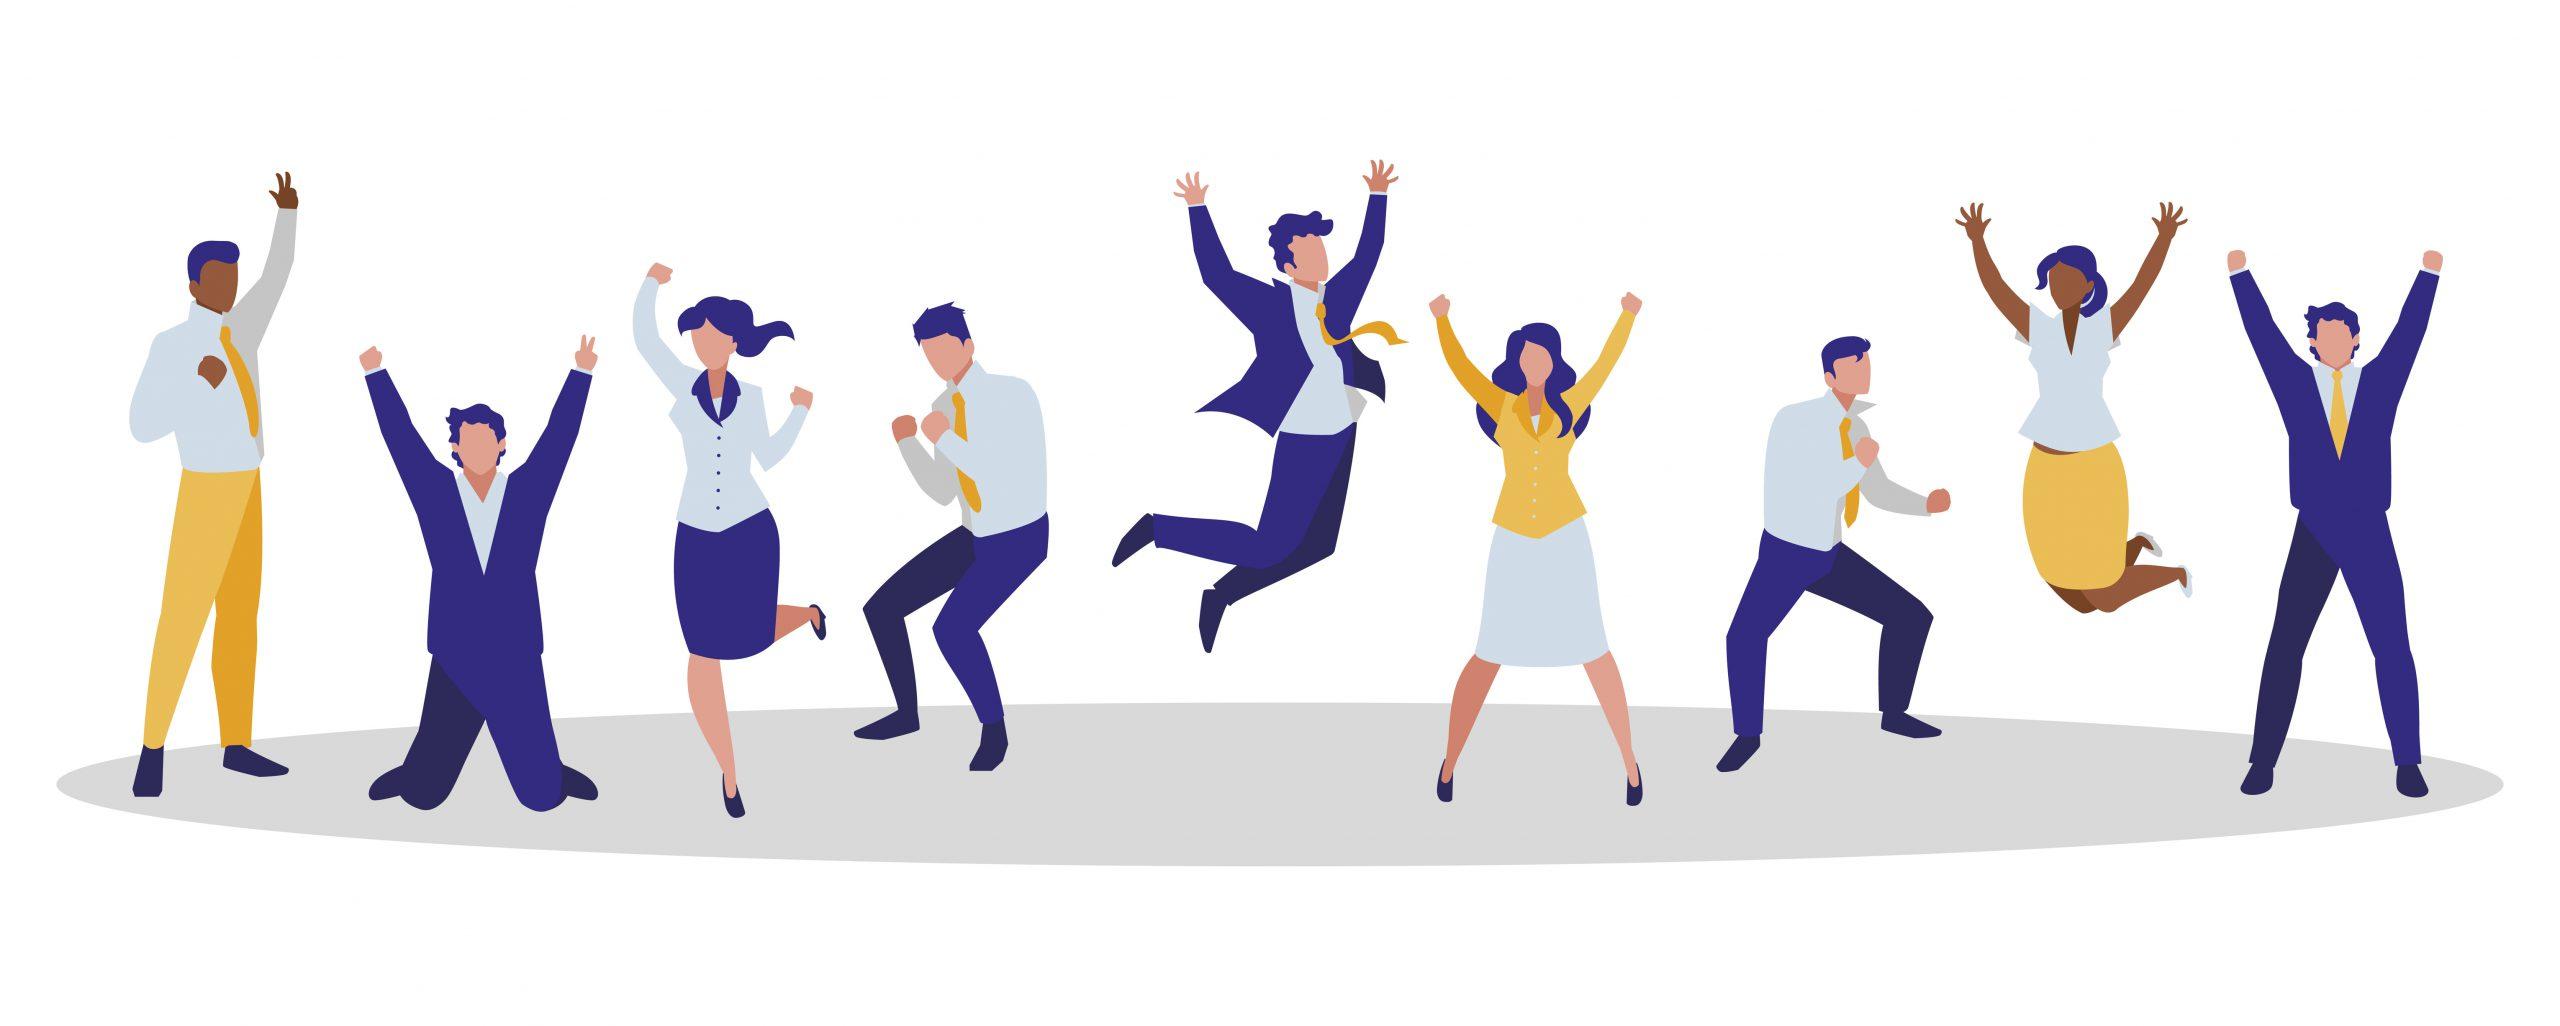 elegant business people celebrating characters